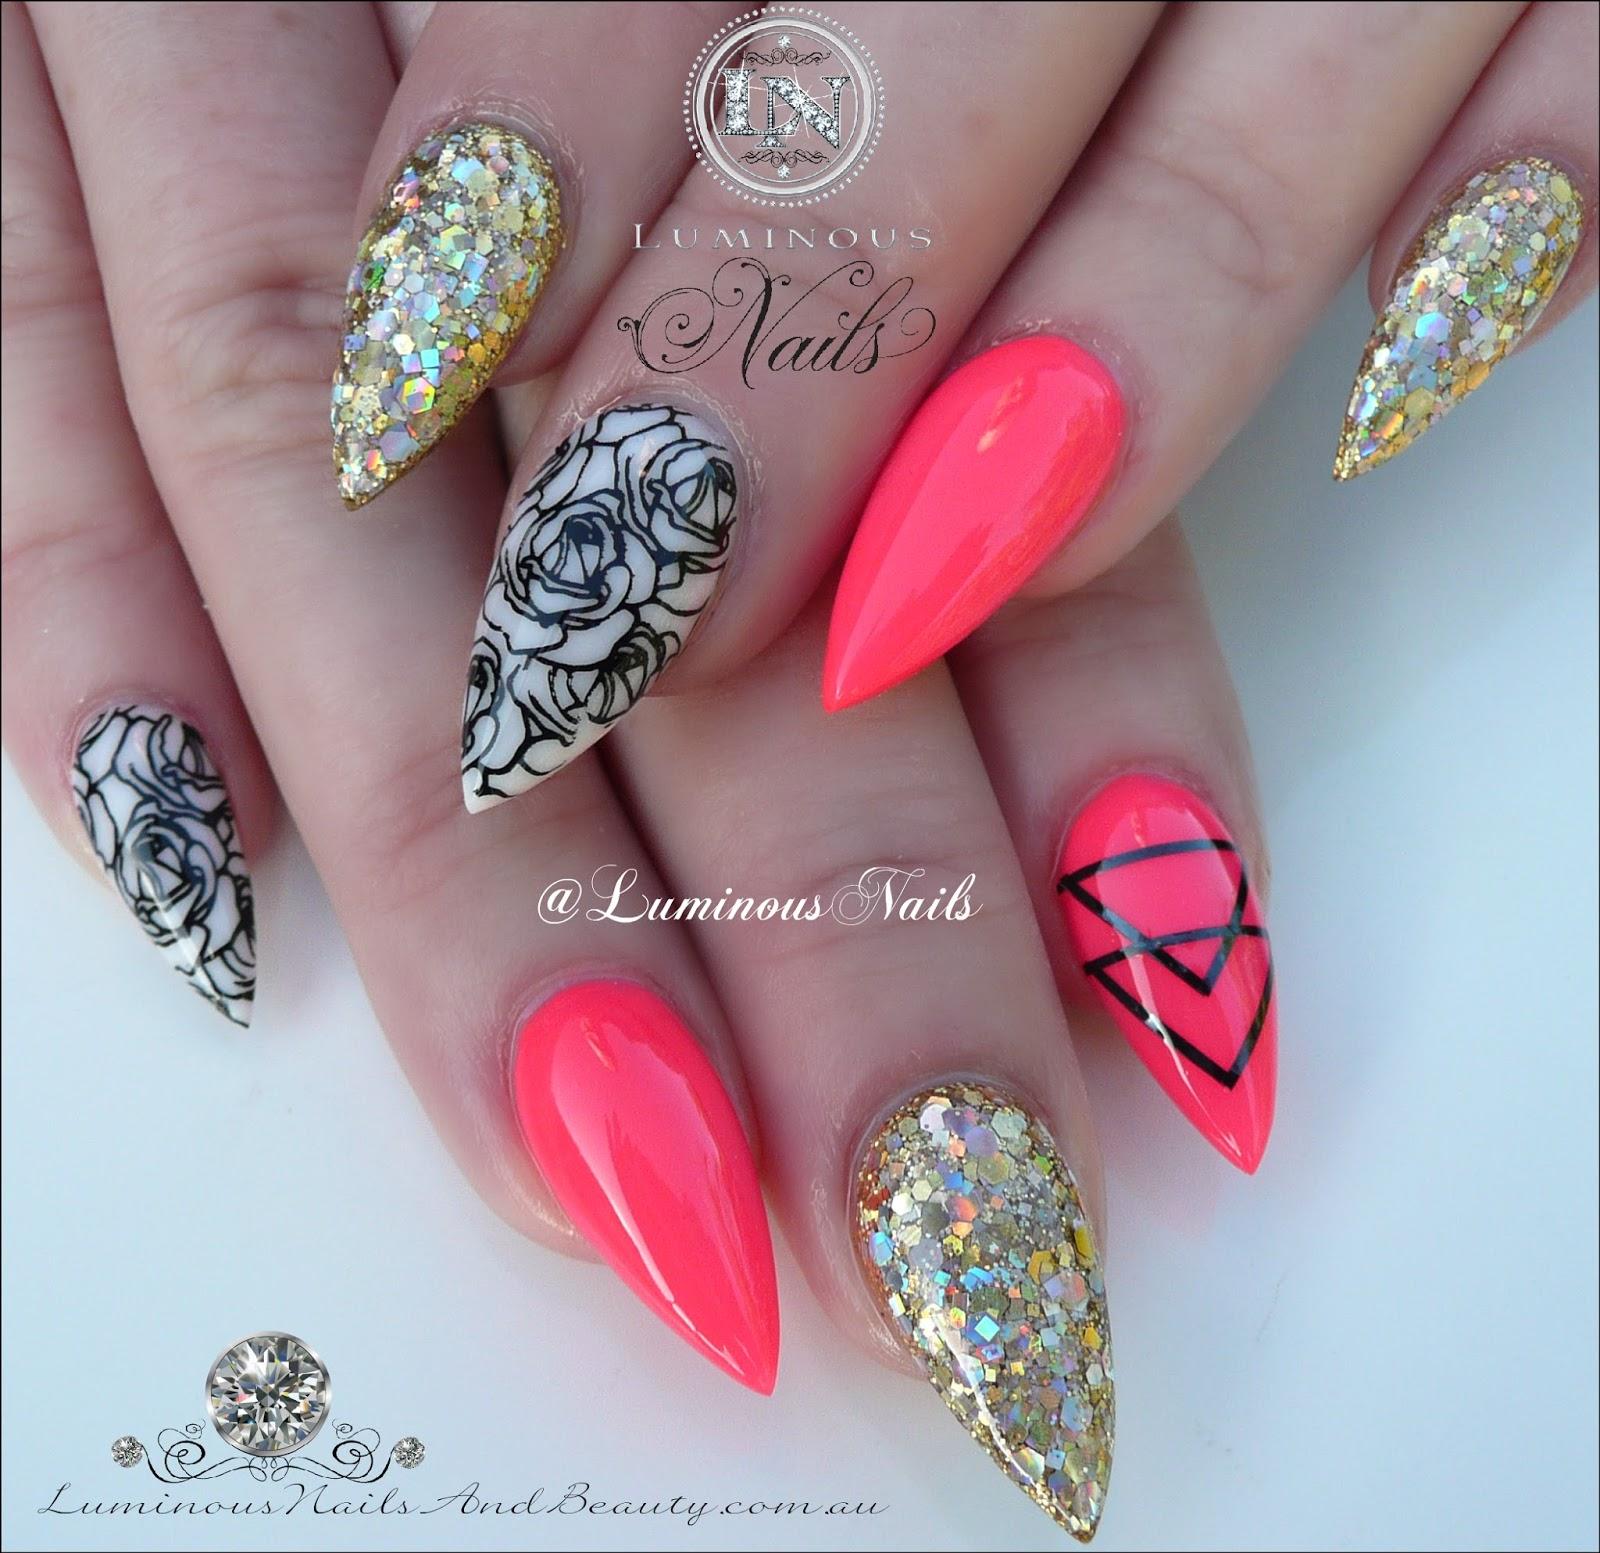 Luminous Nails: Neon Raspberry, Gold, White Acrylic Nails with ...